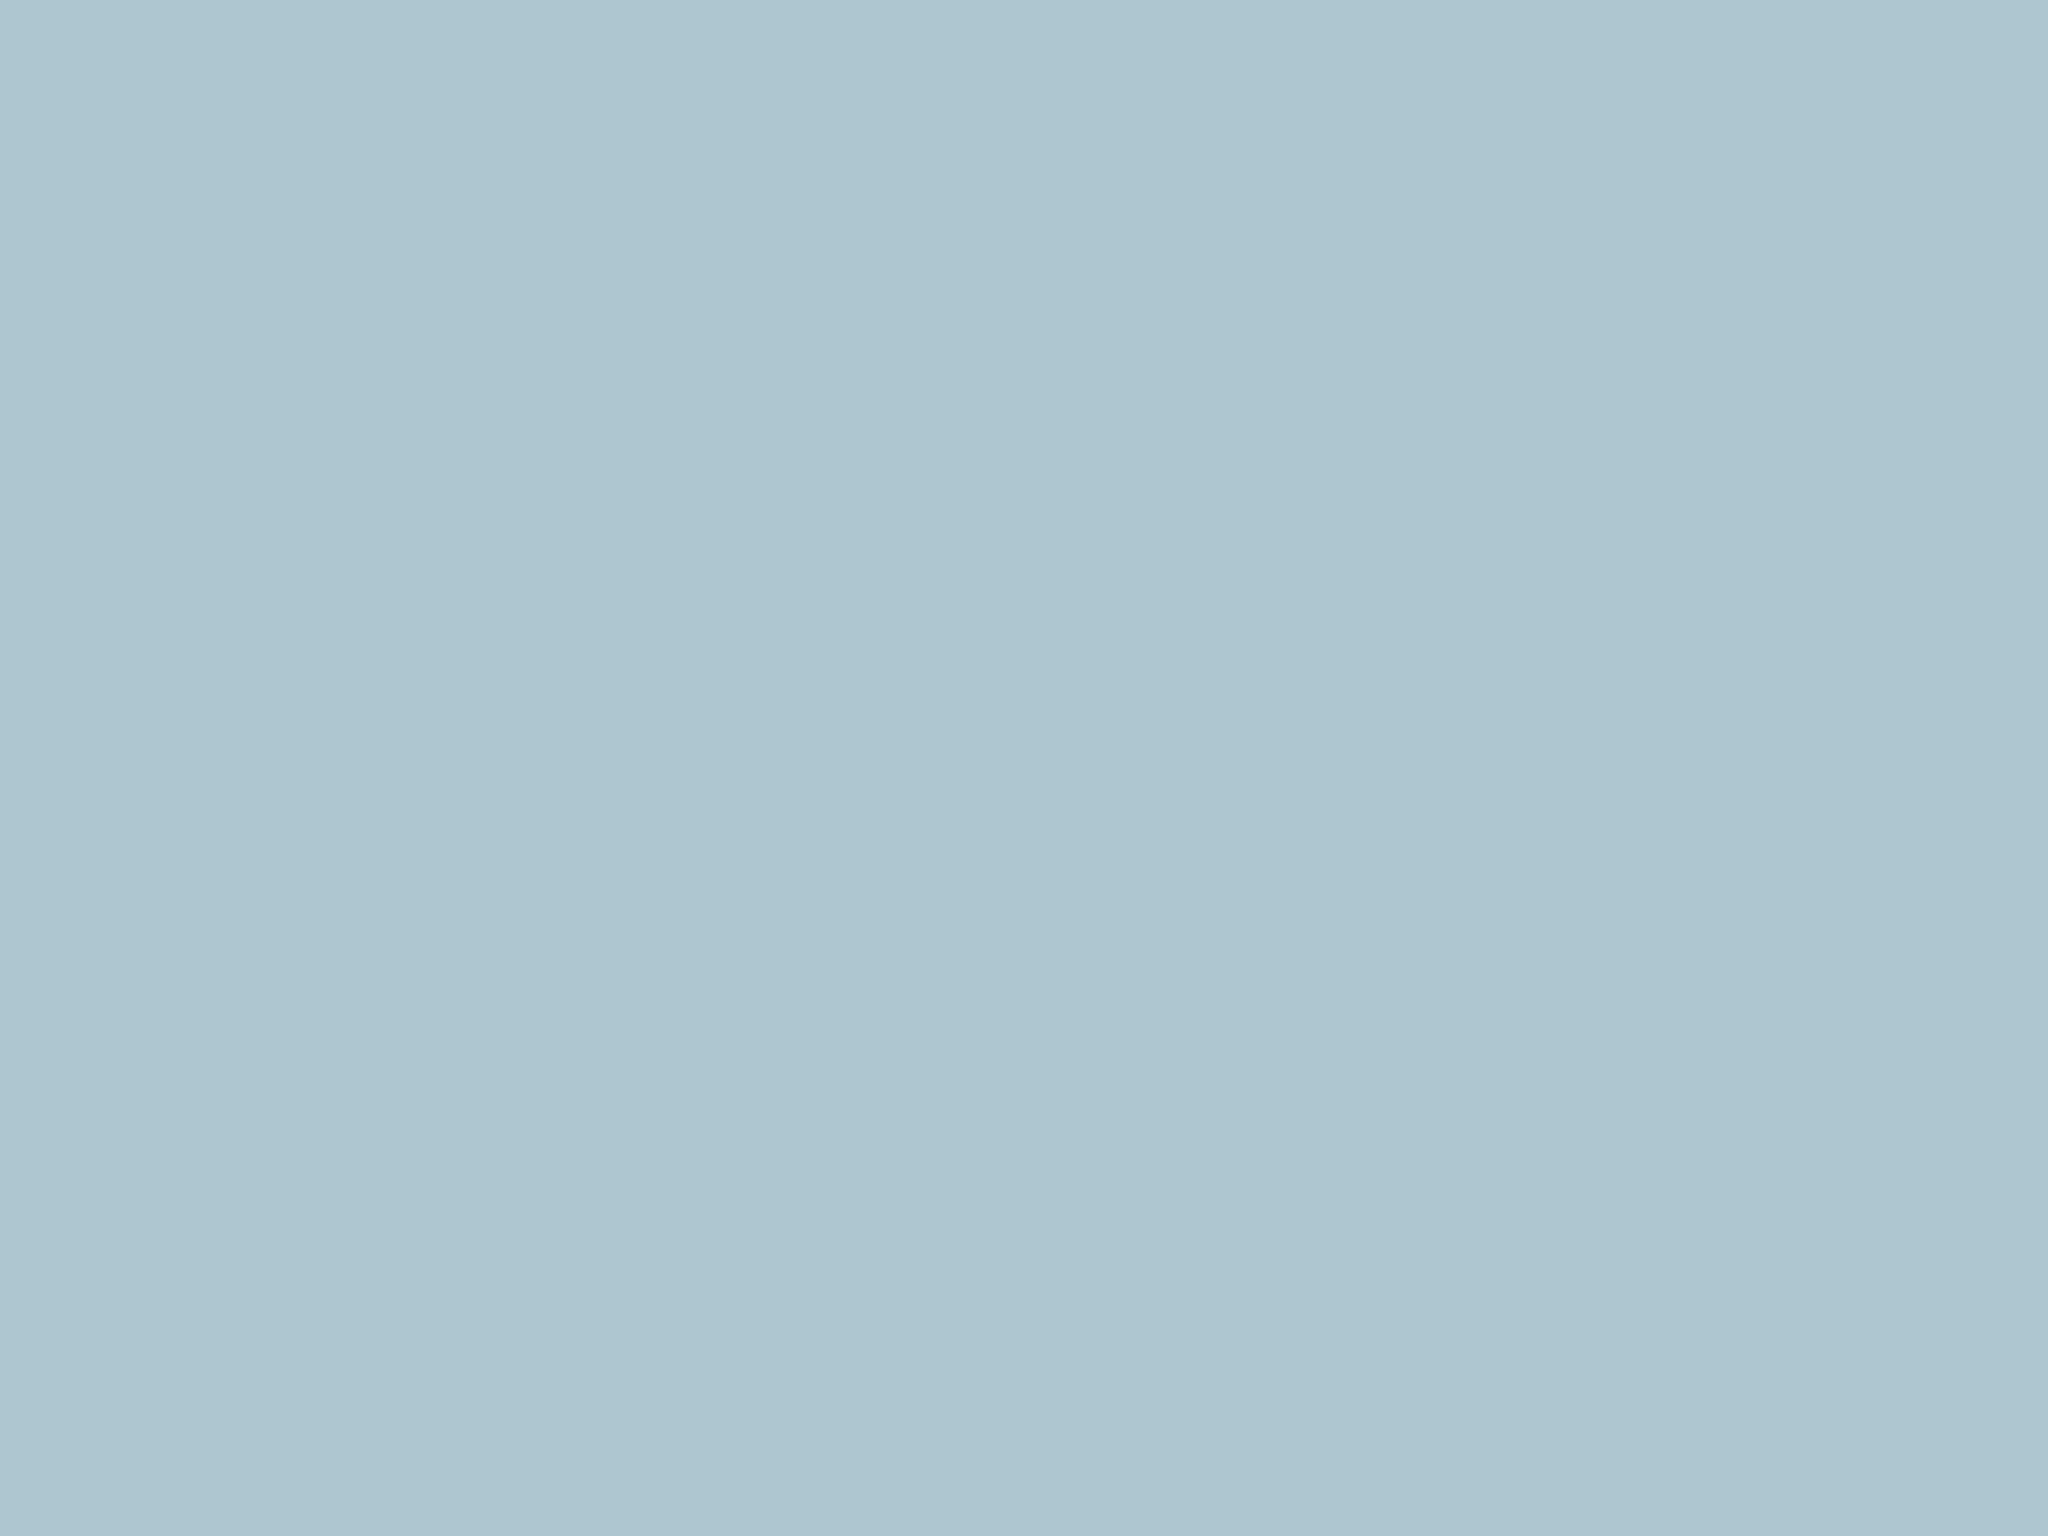 2048x1536 Pastel Blue Solid Color Background